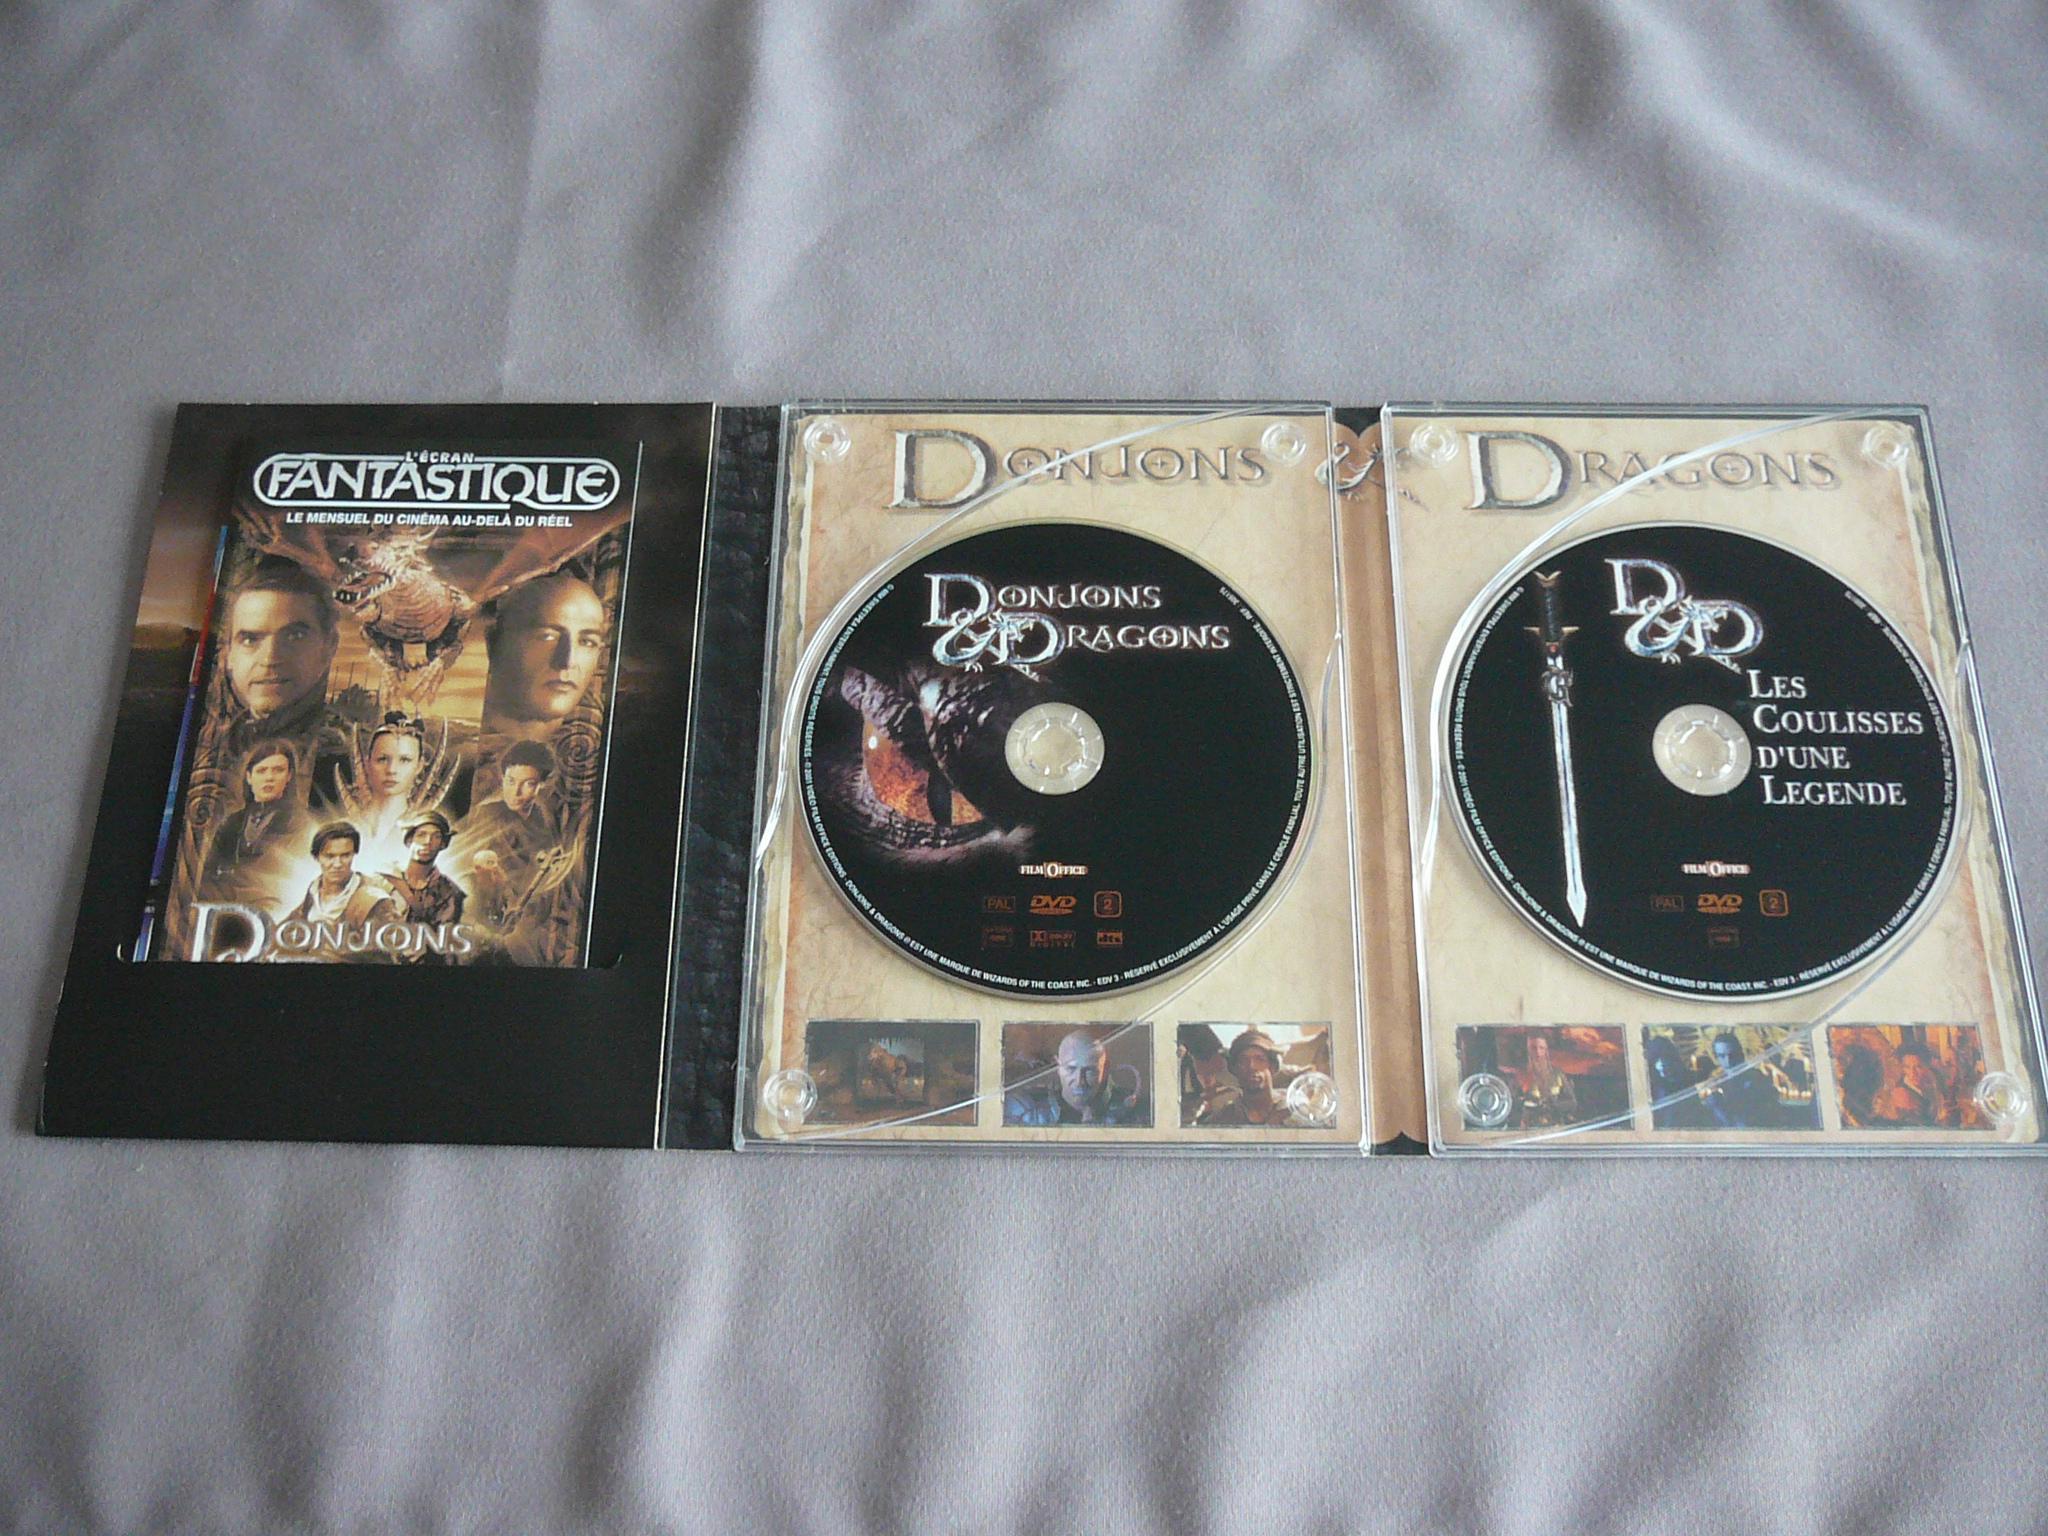 troc de troc dvd donjons & dragons image 1